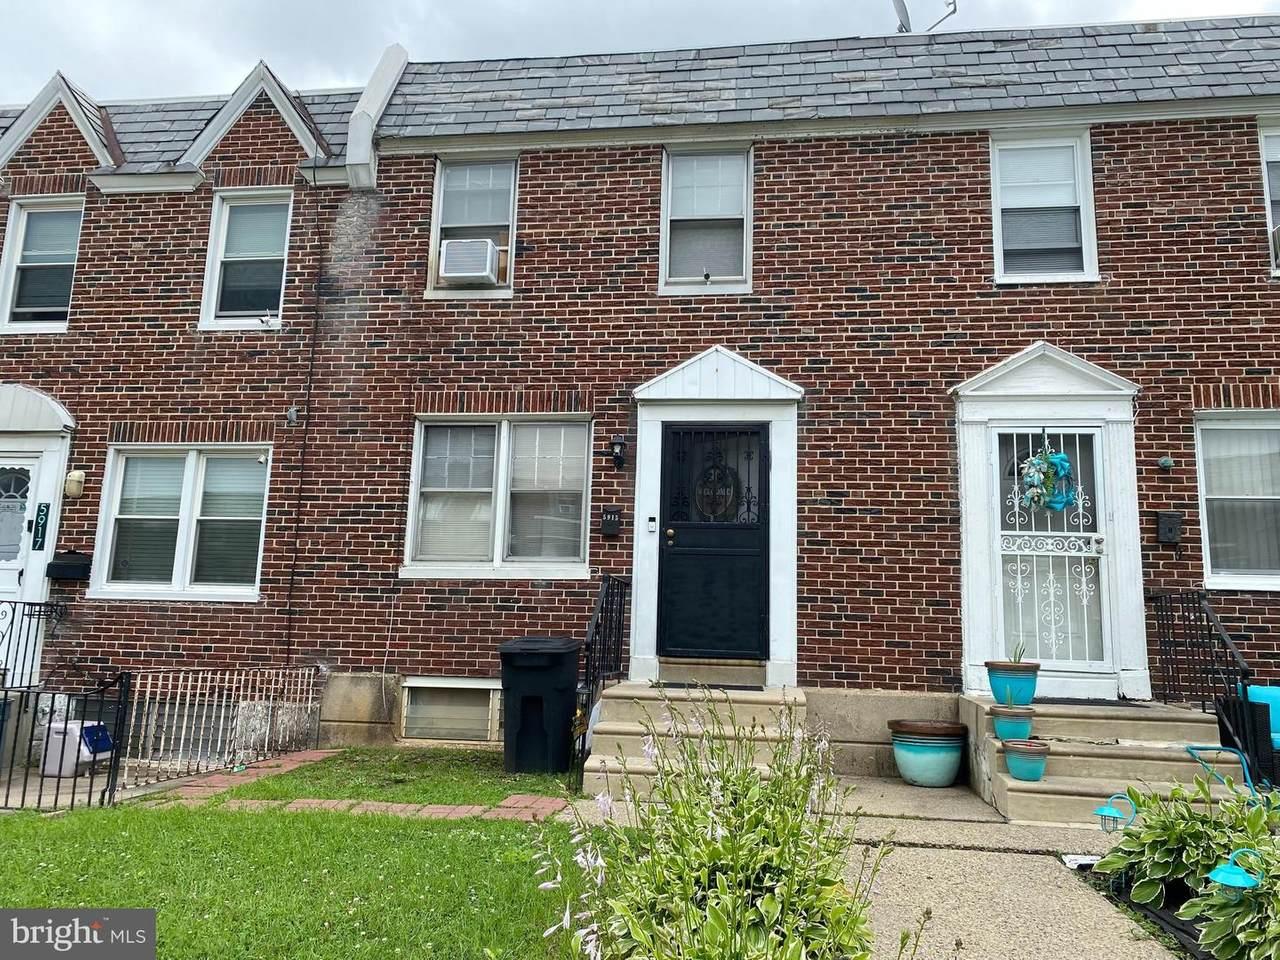 5915 B Street - Photo 1